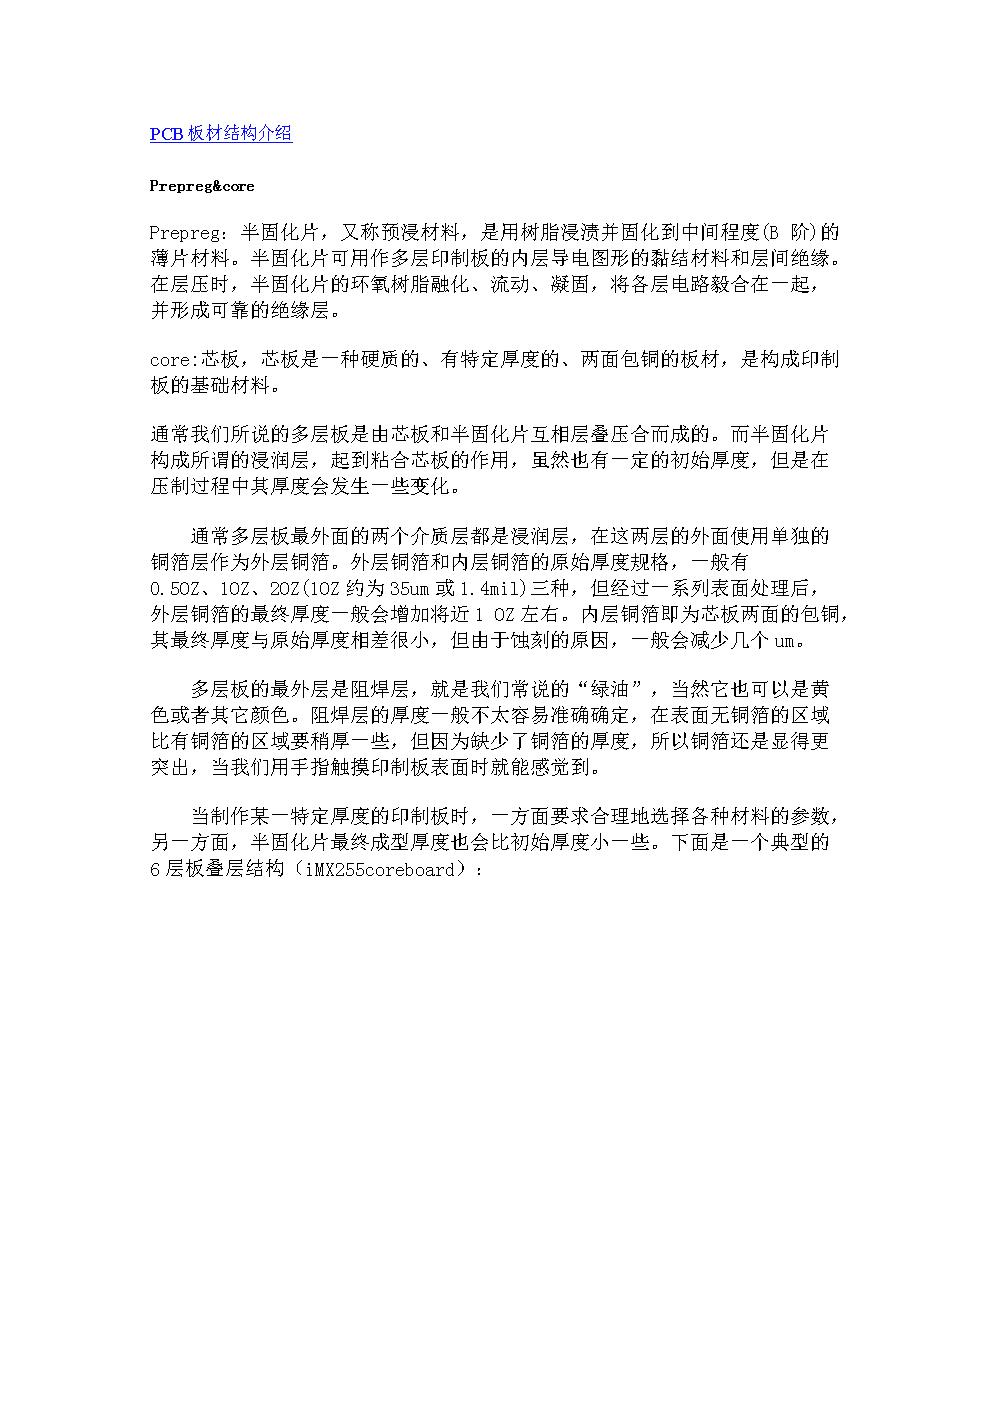 PCB板材结构介绍zhuan.doc